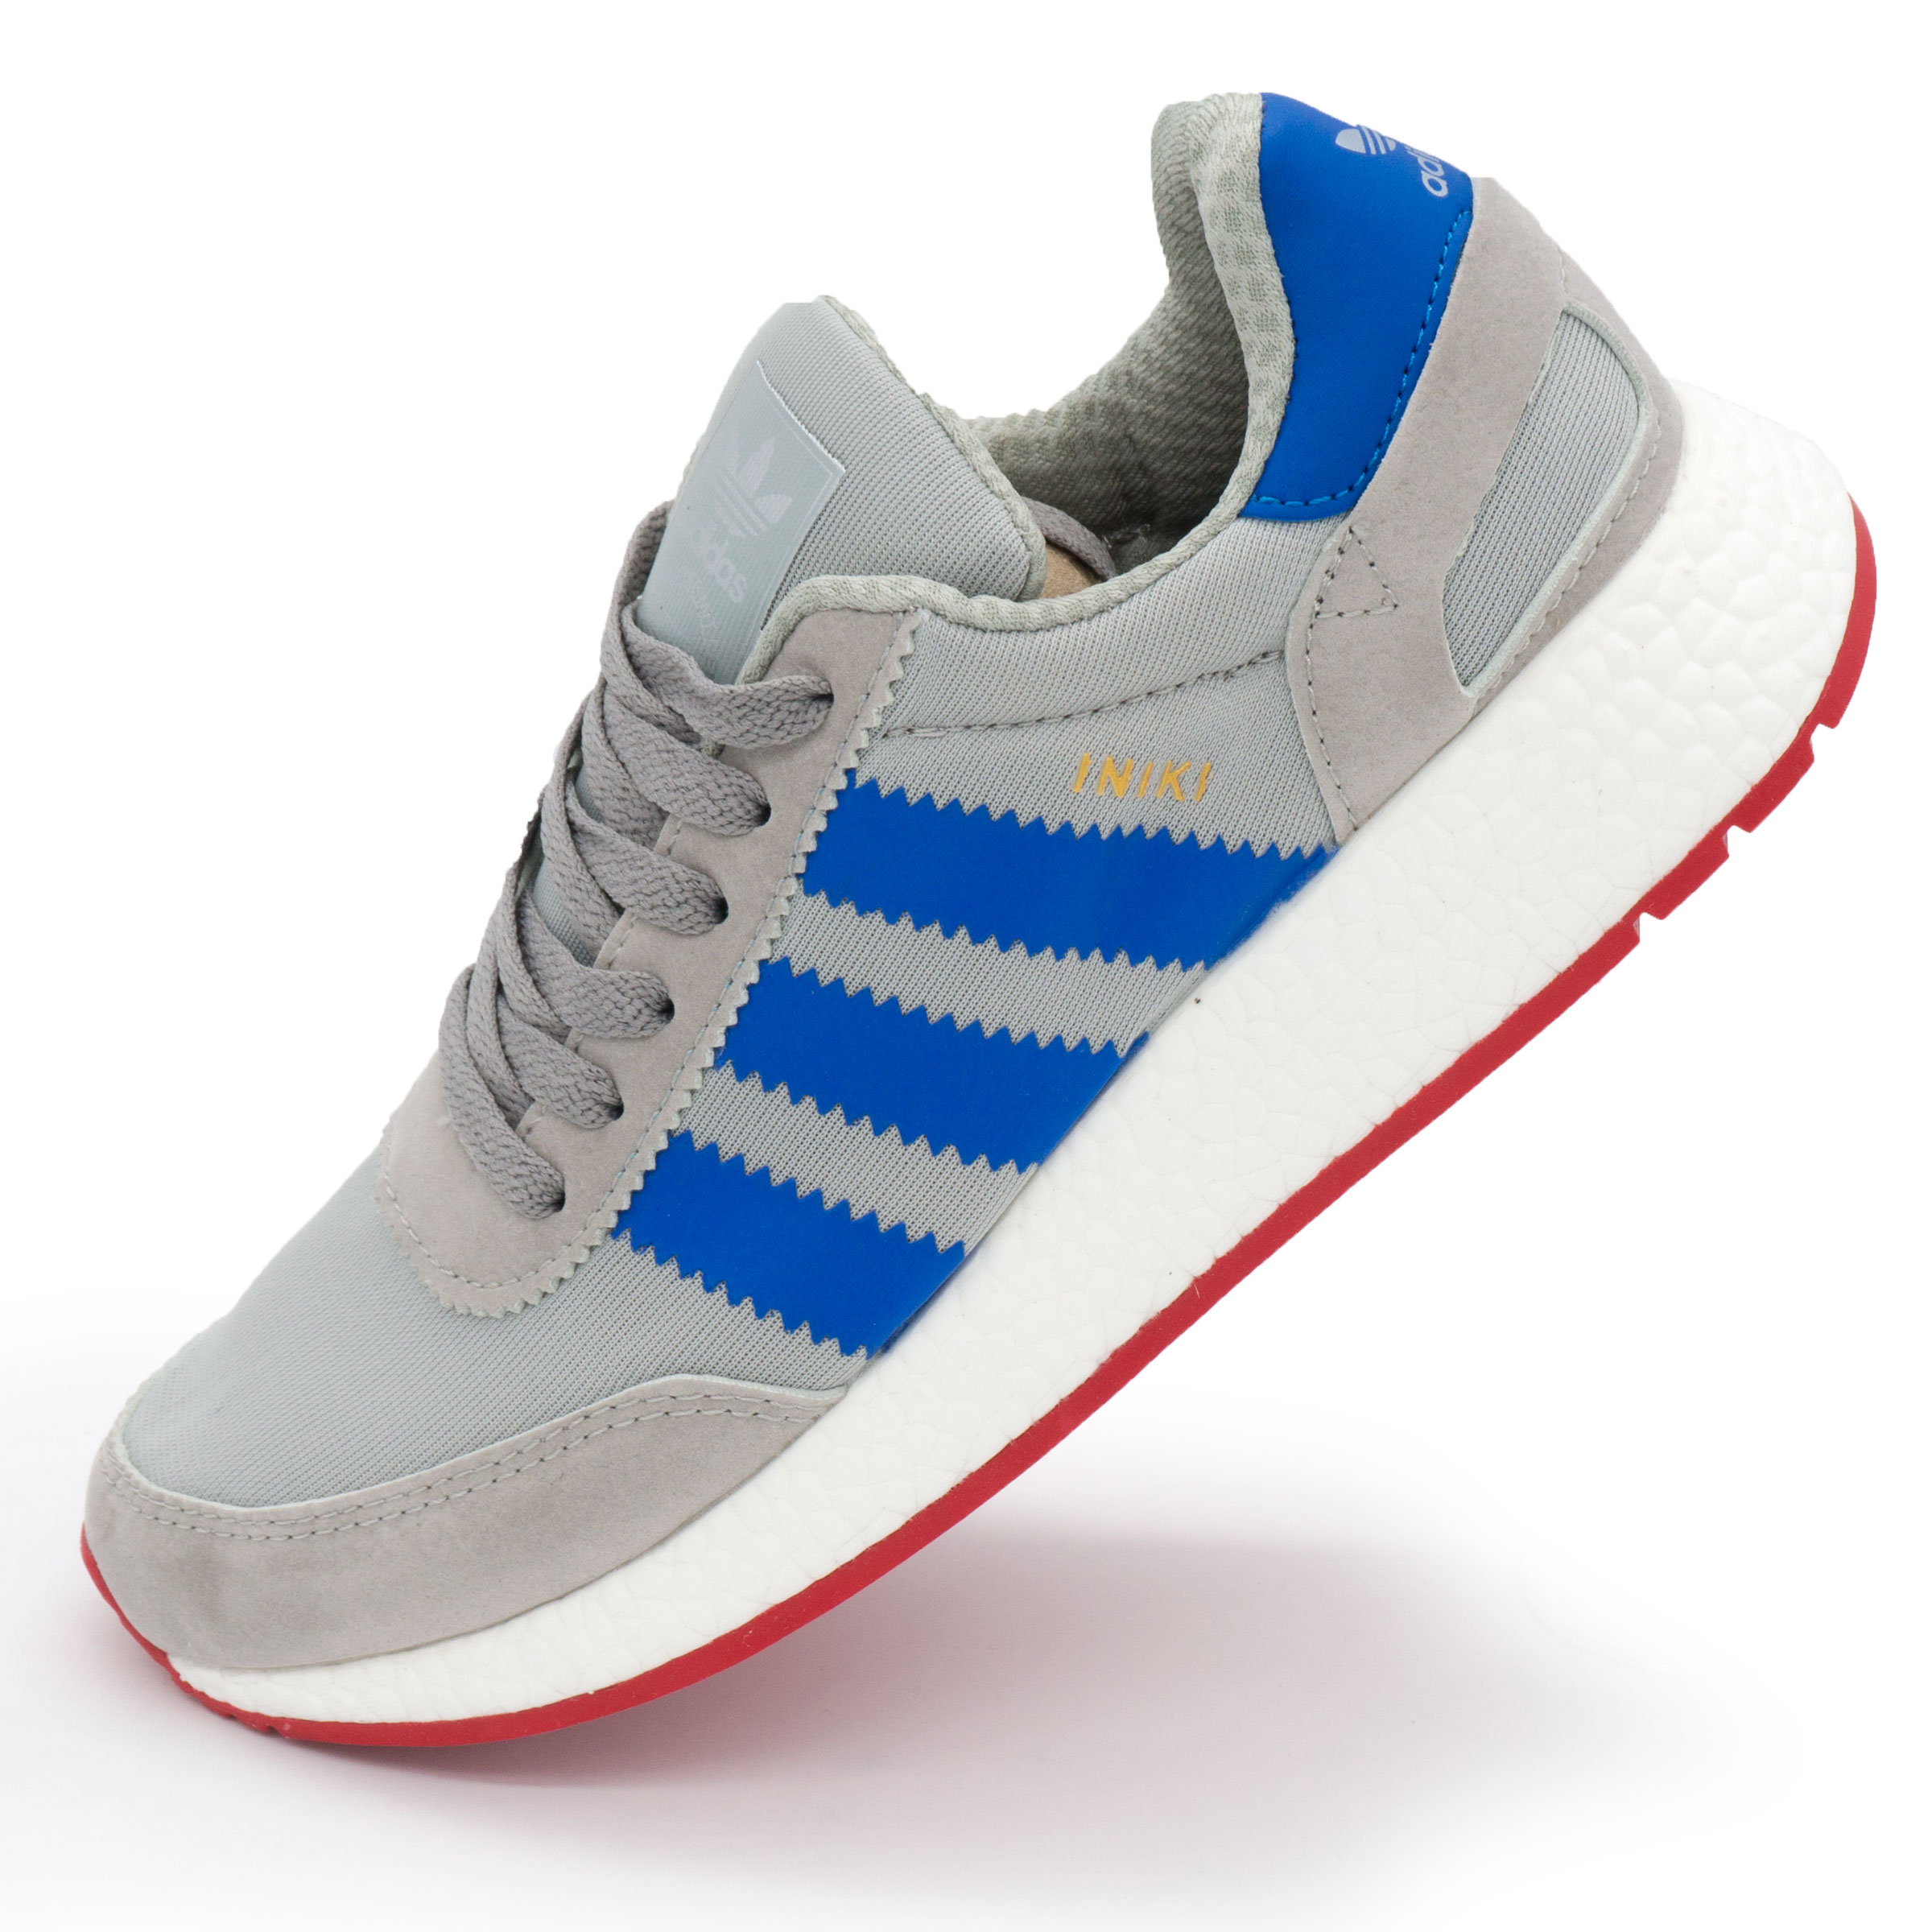 823573fb ... фото main Кроссовки для бега Adidas Iniki Runner серые с синим main ...